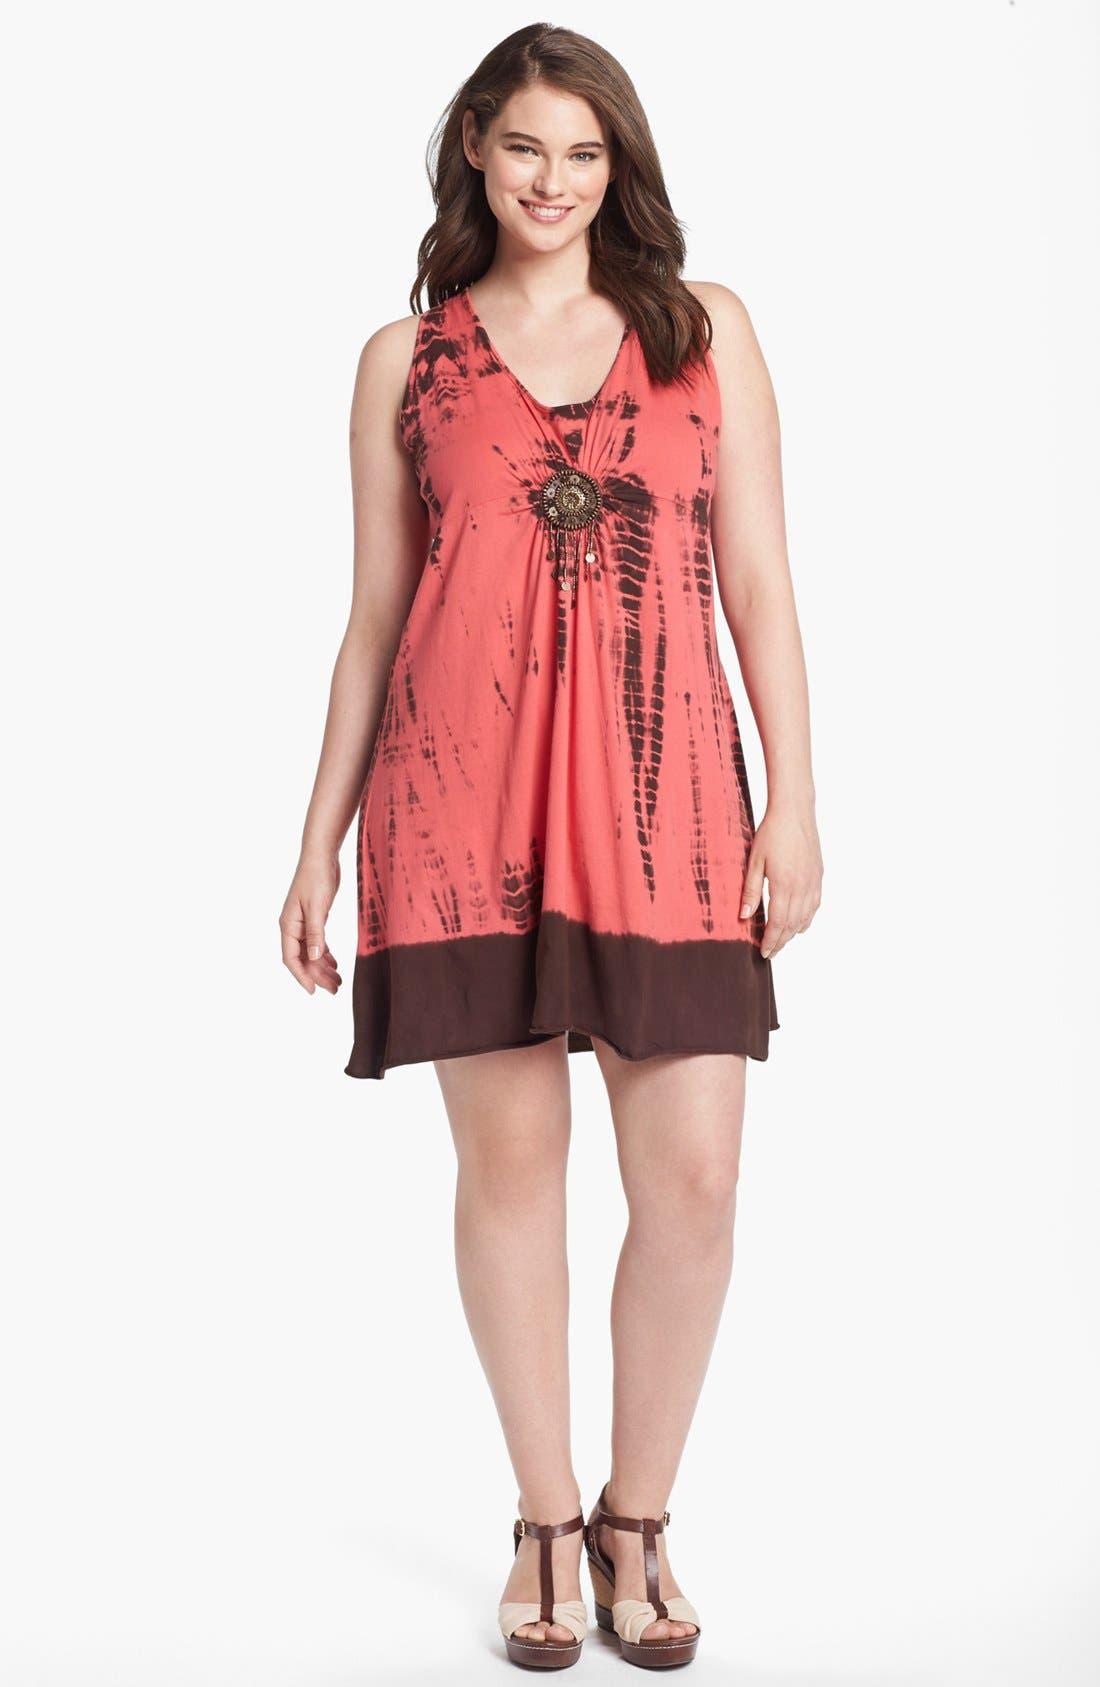 Alternate Image 1 Selected - Pink Lotus Embellished Tie Dye Dress (Plus Size)